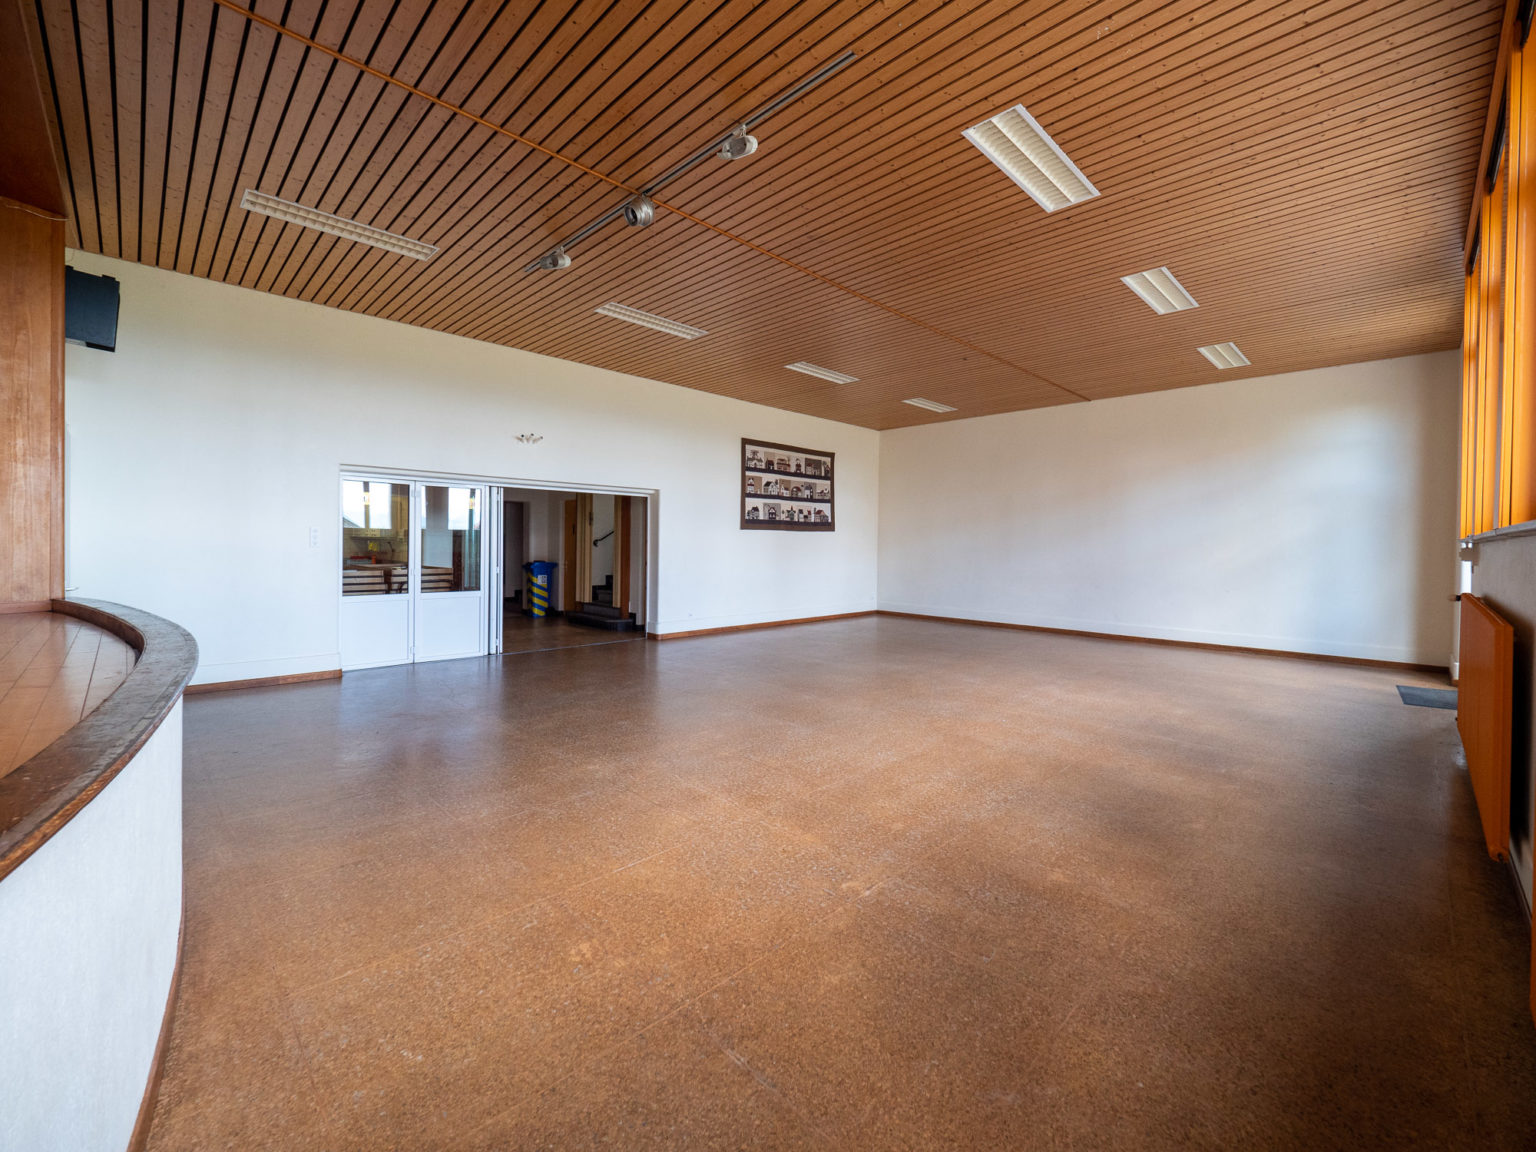 Refuges-salles-Montanaire©V-Dubach-52715